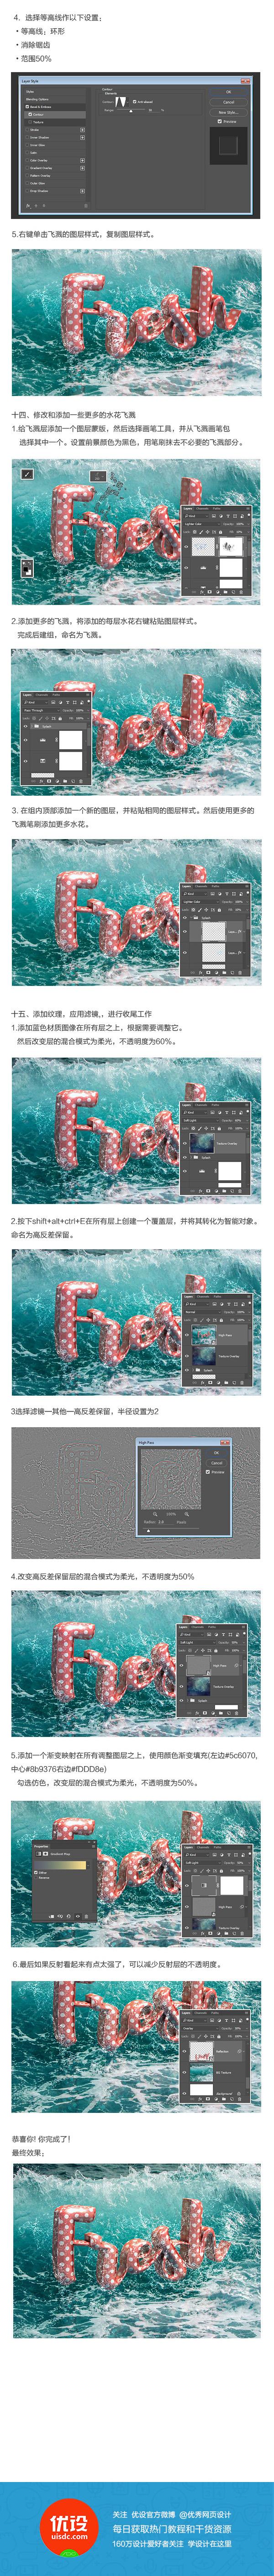 PS进阶教程!教你创建漂浮的泳衣3D字效